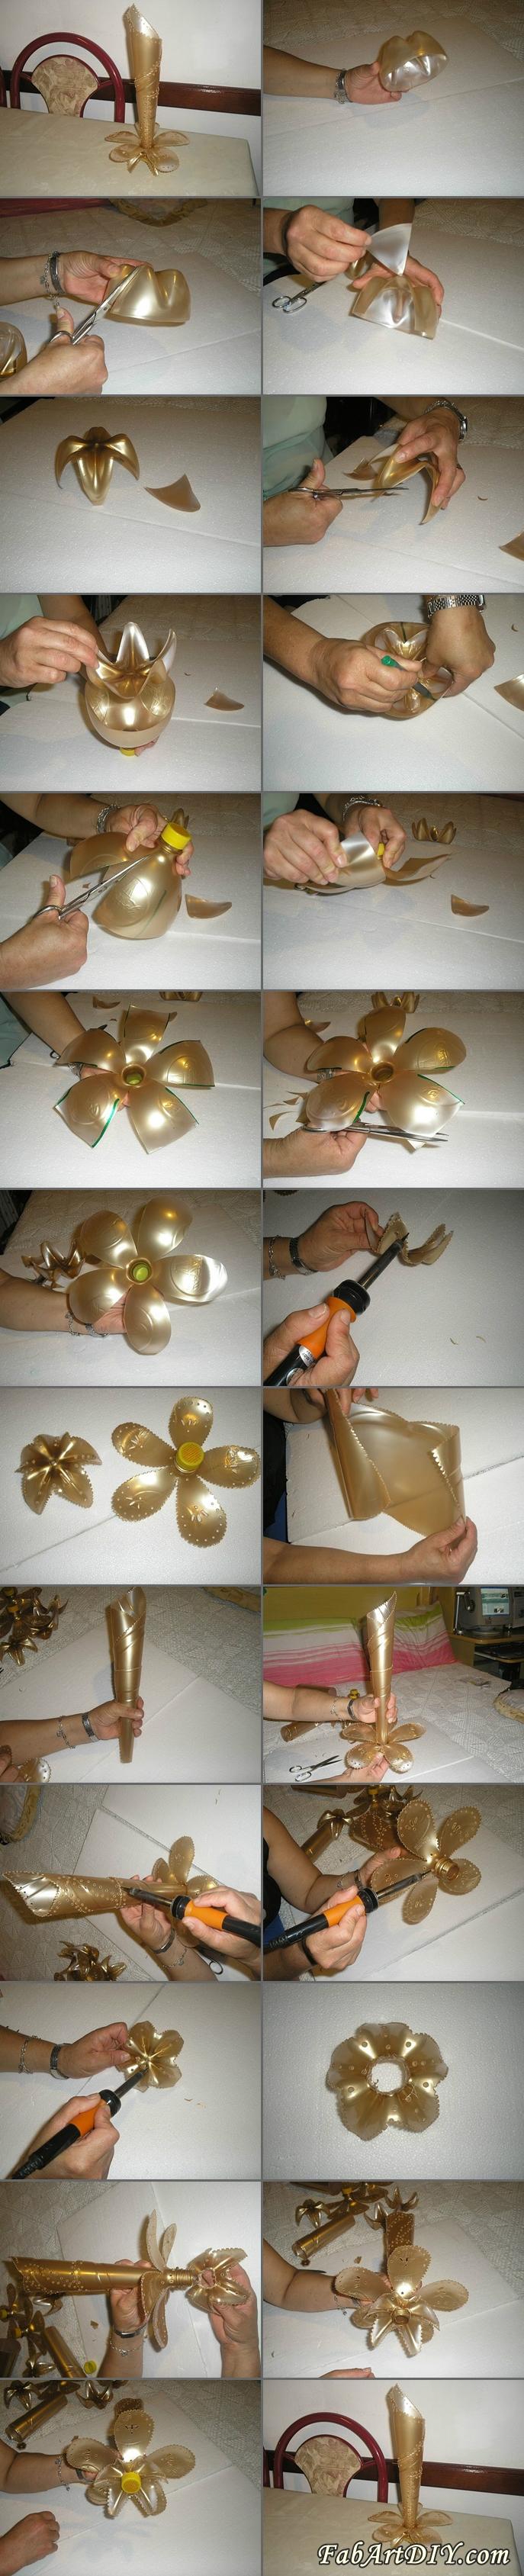 Diy delicate vase from plastic bottle fab art diy plastic bottle vase tutorial reviewsmspy